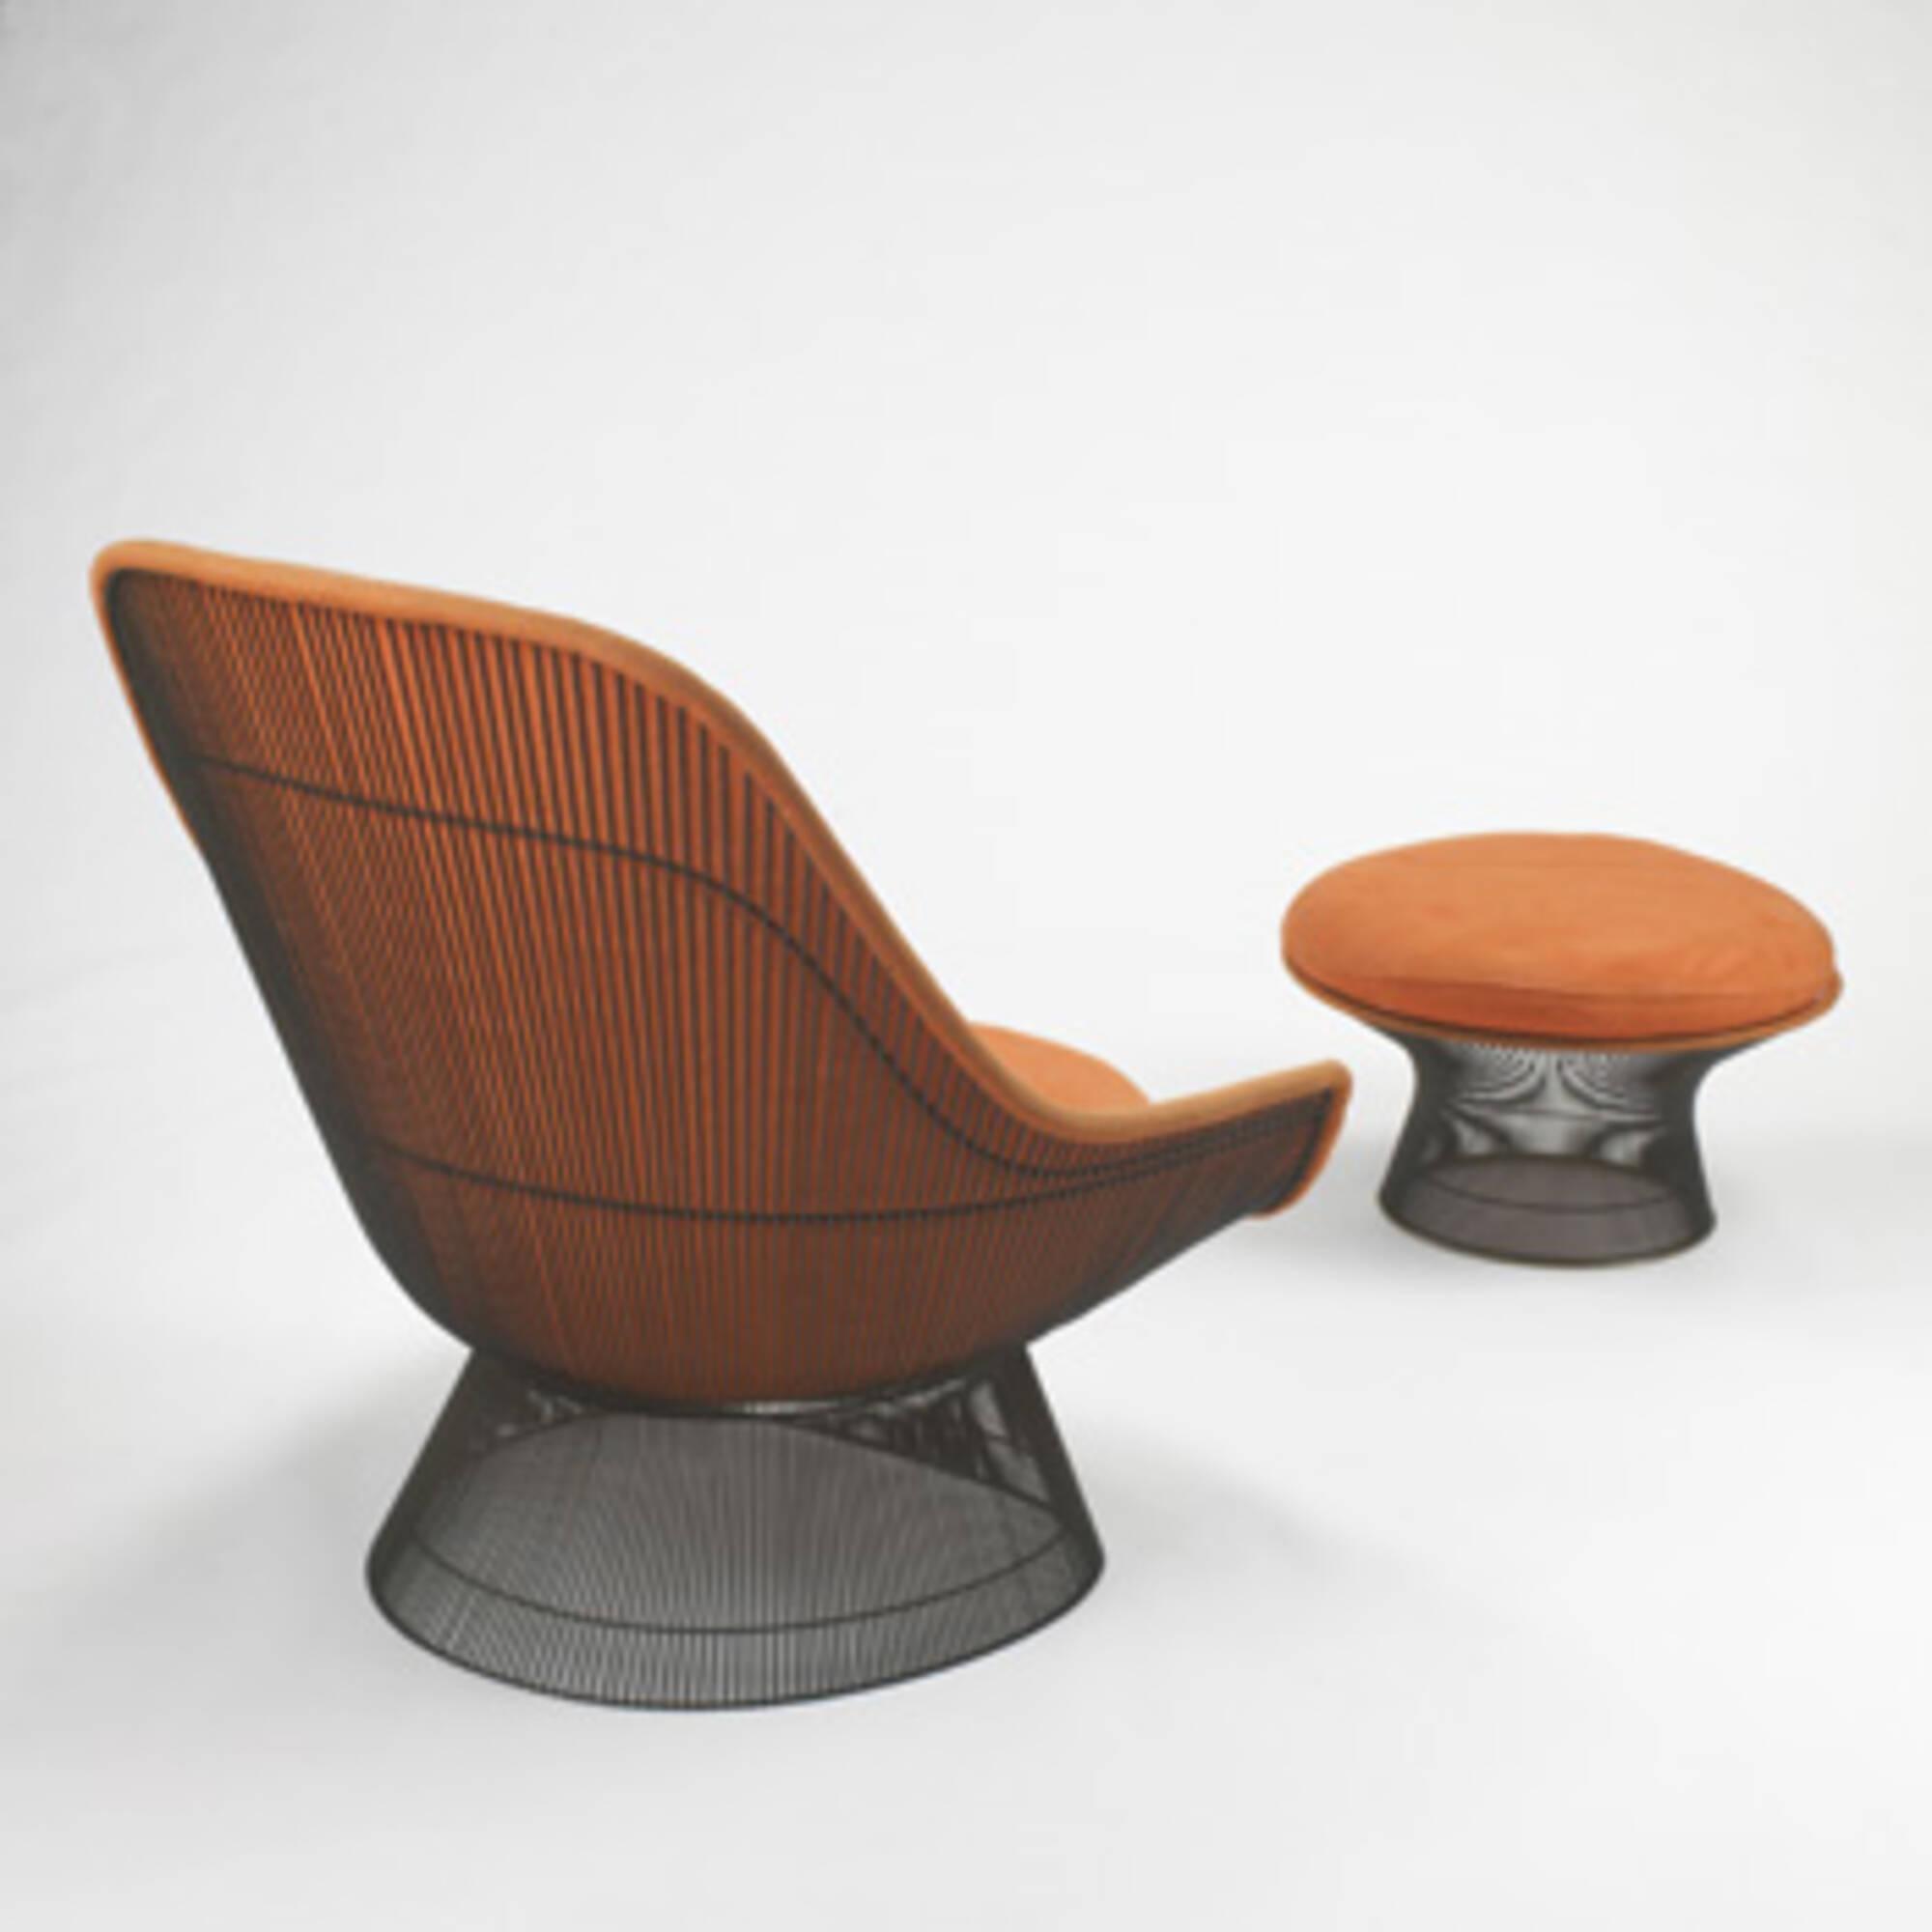 Excellent 314 Warren Platner Lounge Chair And Ottoman Modern Andrewgaddart Wooden Chair Designs For Living Room Andrewgaddartcom